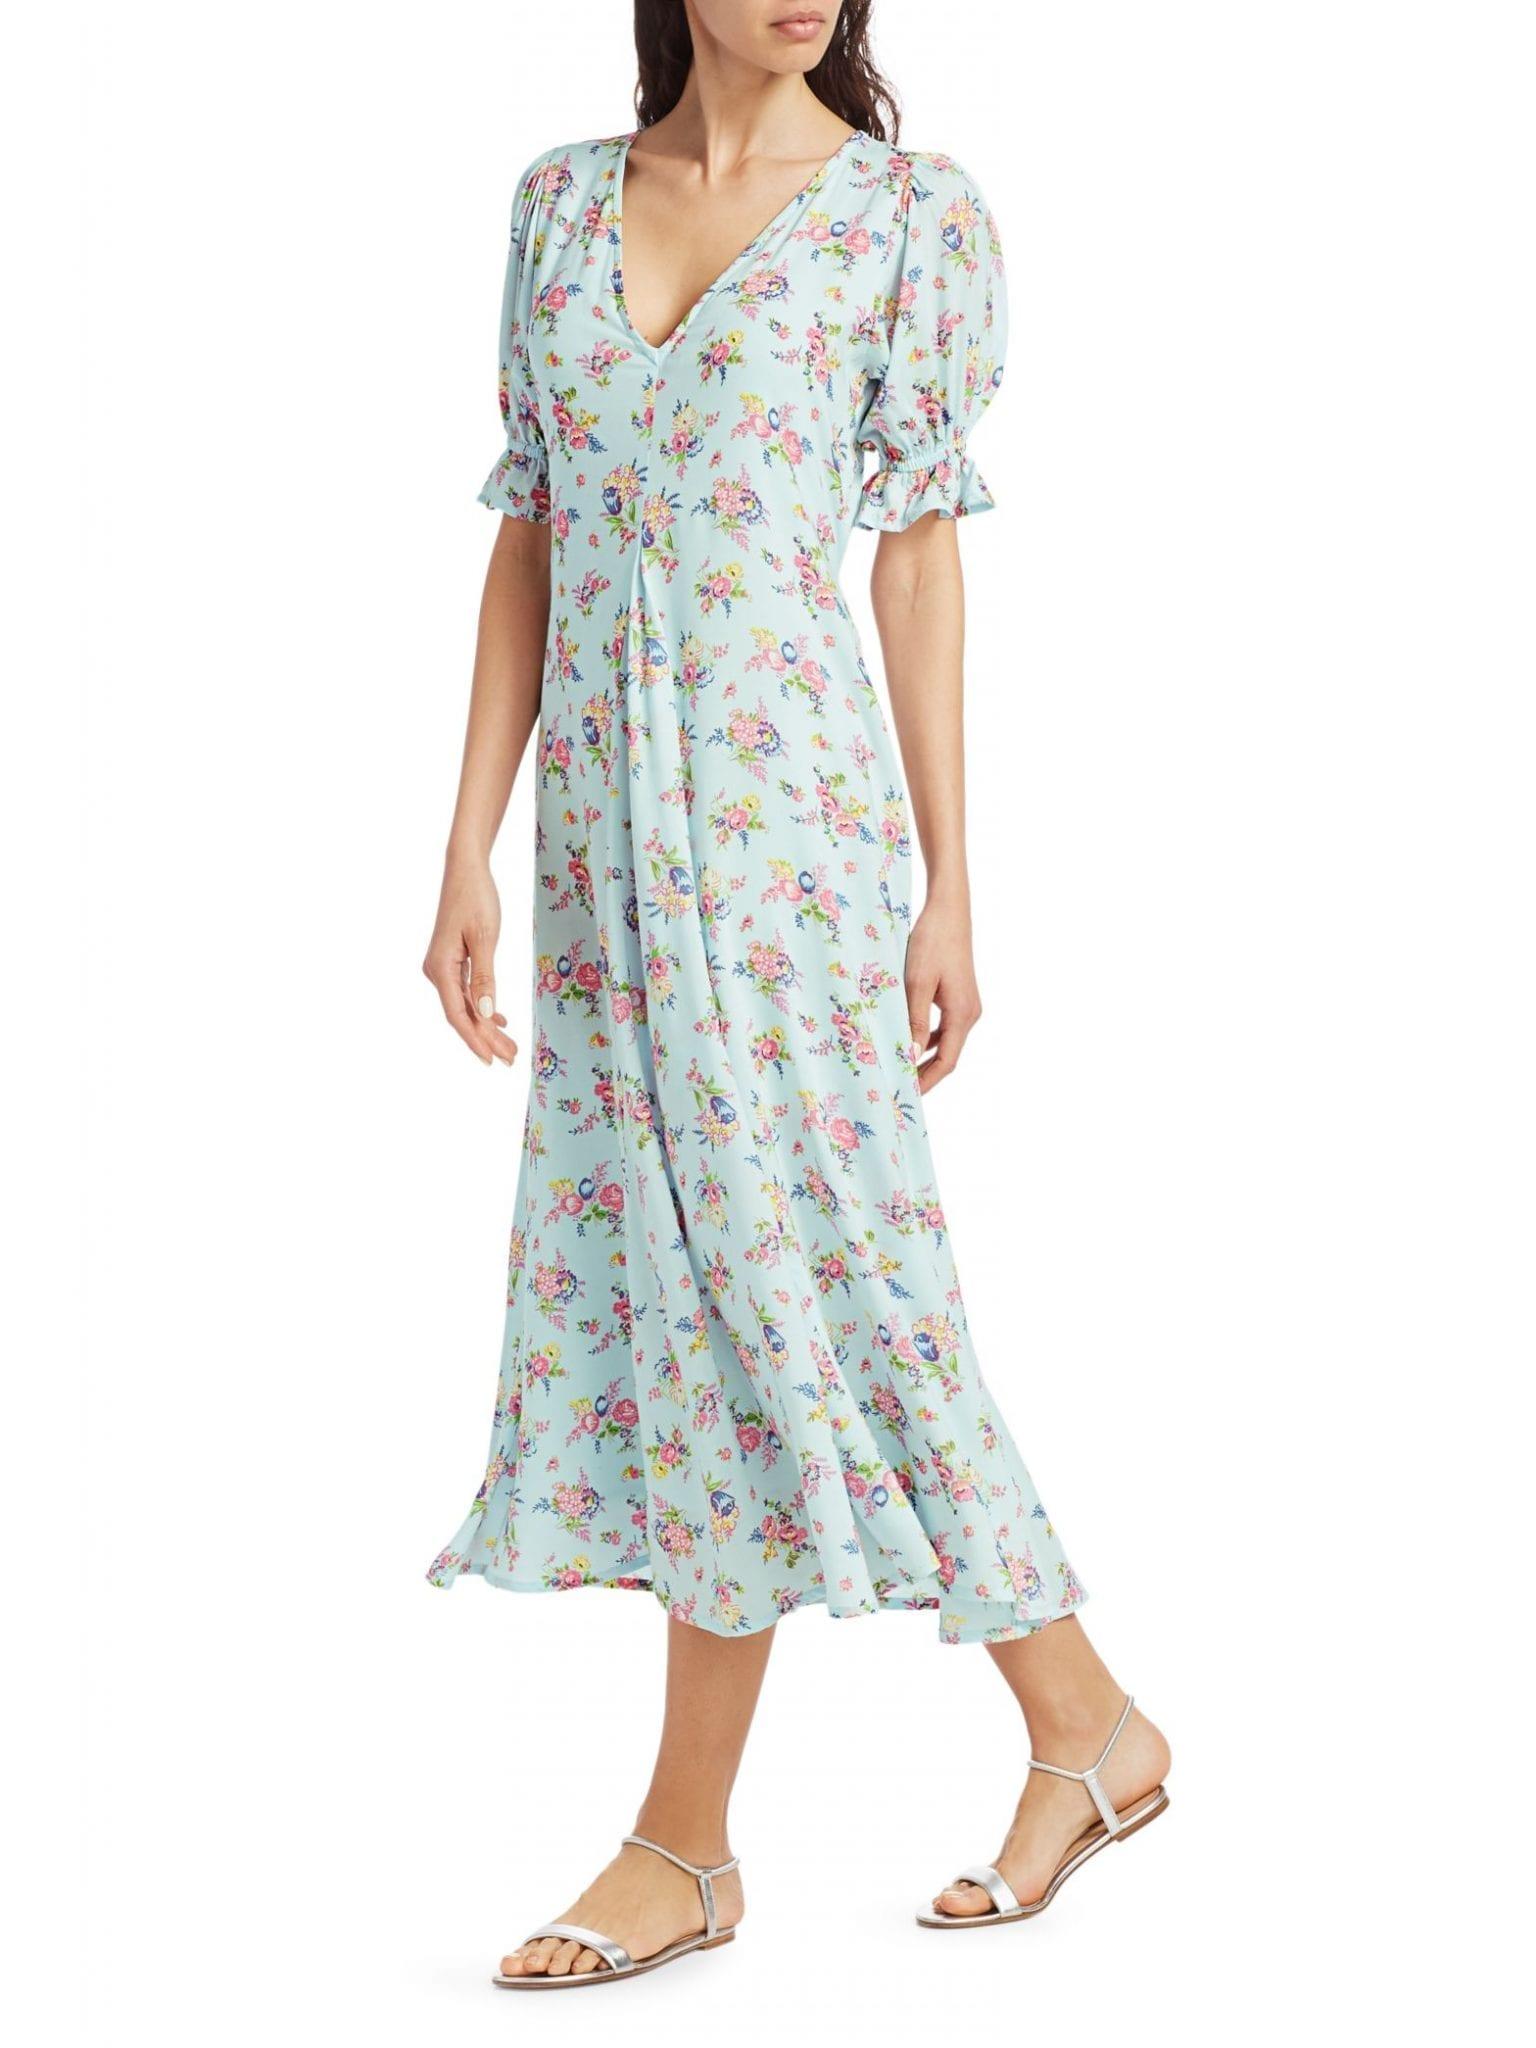 FAITHFULL THE BRAND Maggie Floral Midi Dress